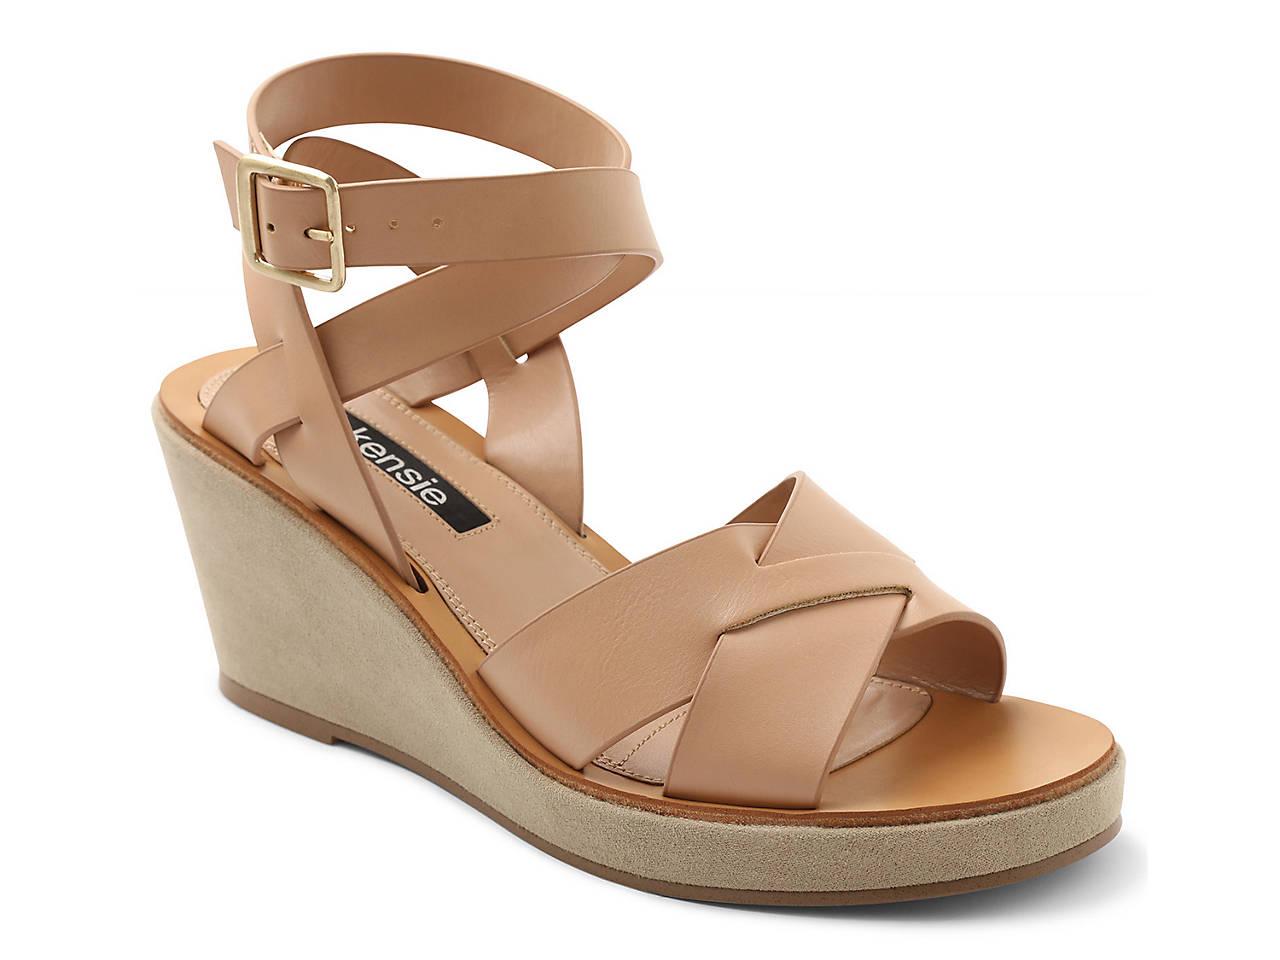 cbdd46944ec Kensie Venezia Wedge Sandal Women s Shoes